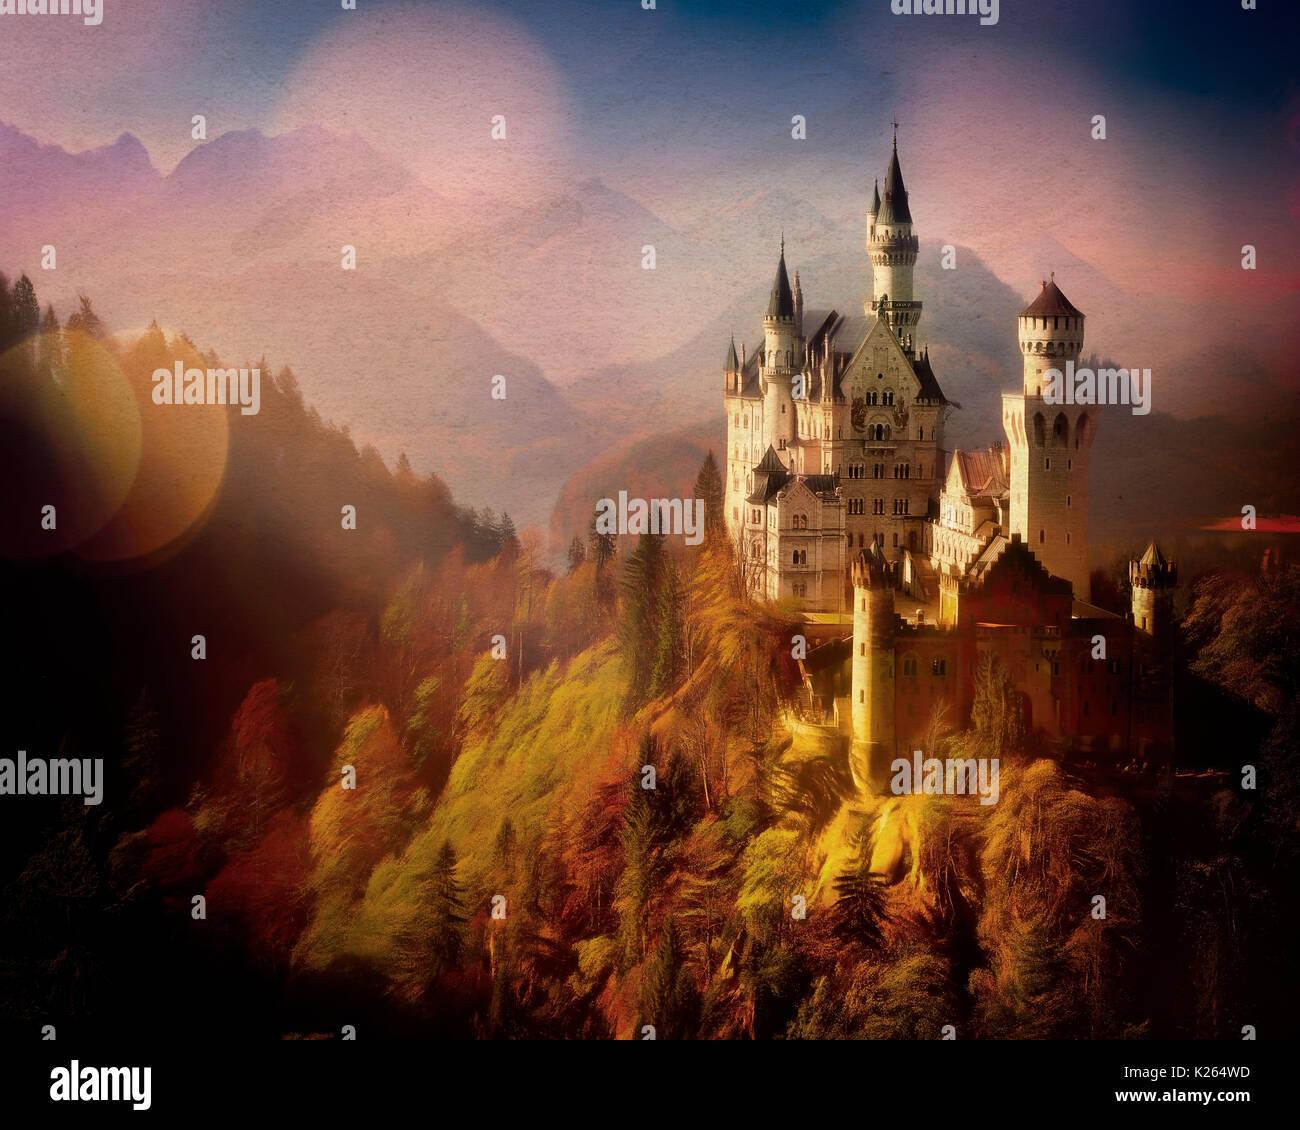 DIGITAL ART: Neuschwanstein Castle, Bavaria, Germany - Stock Image